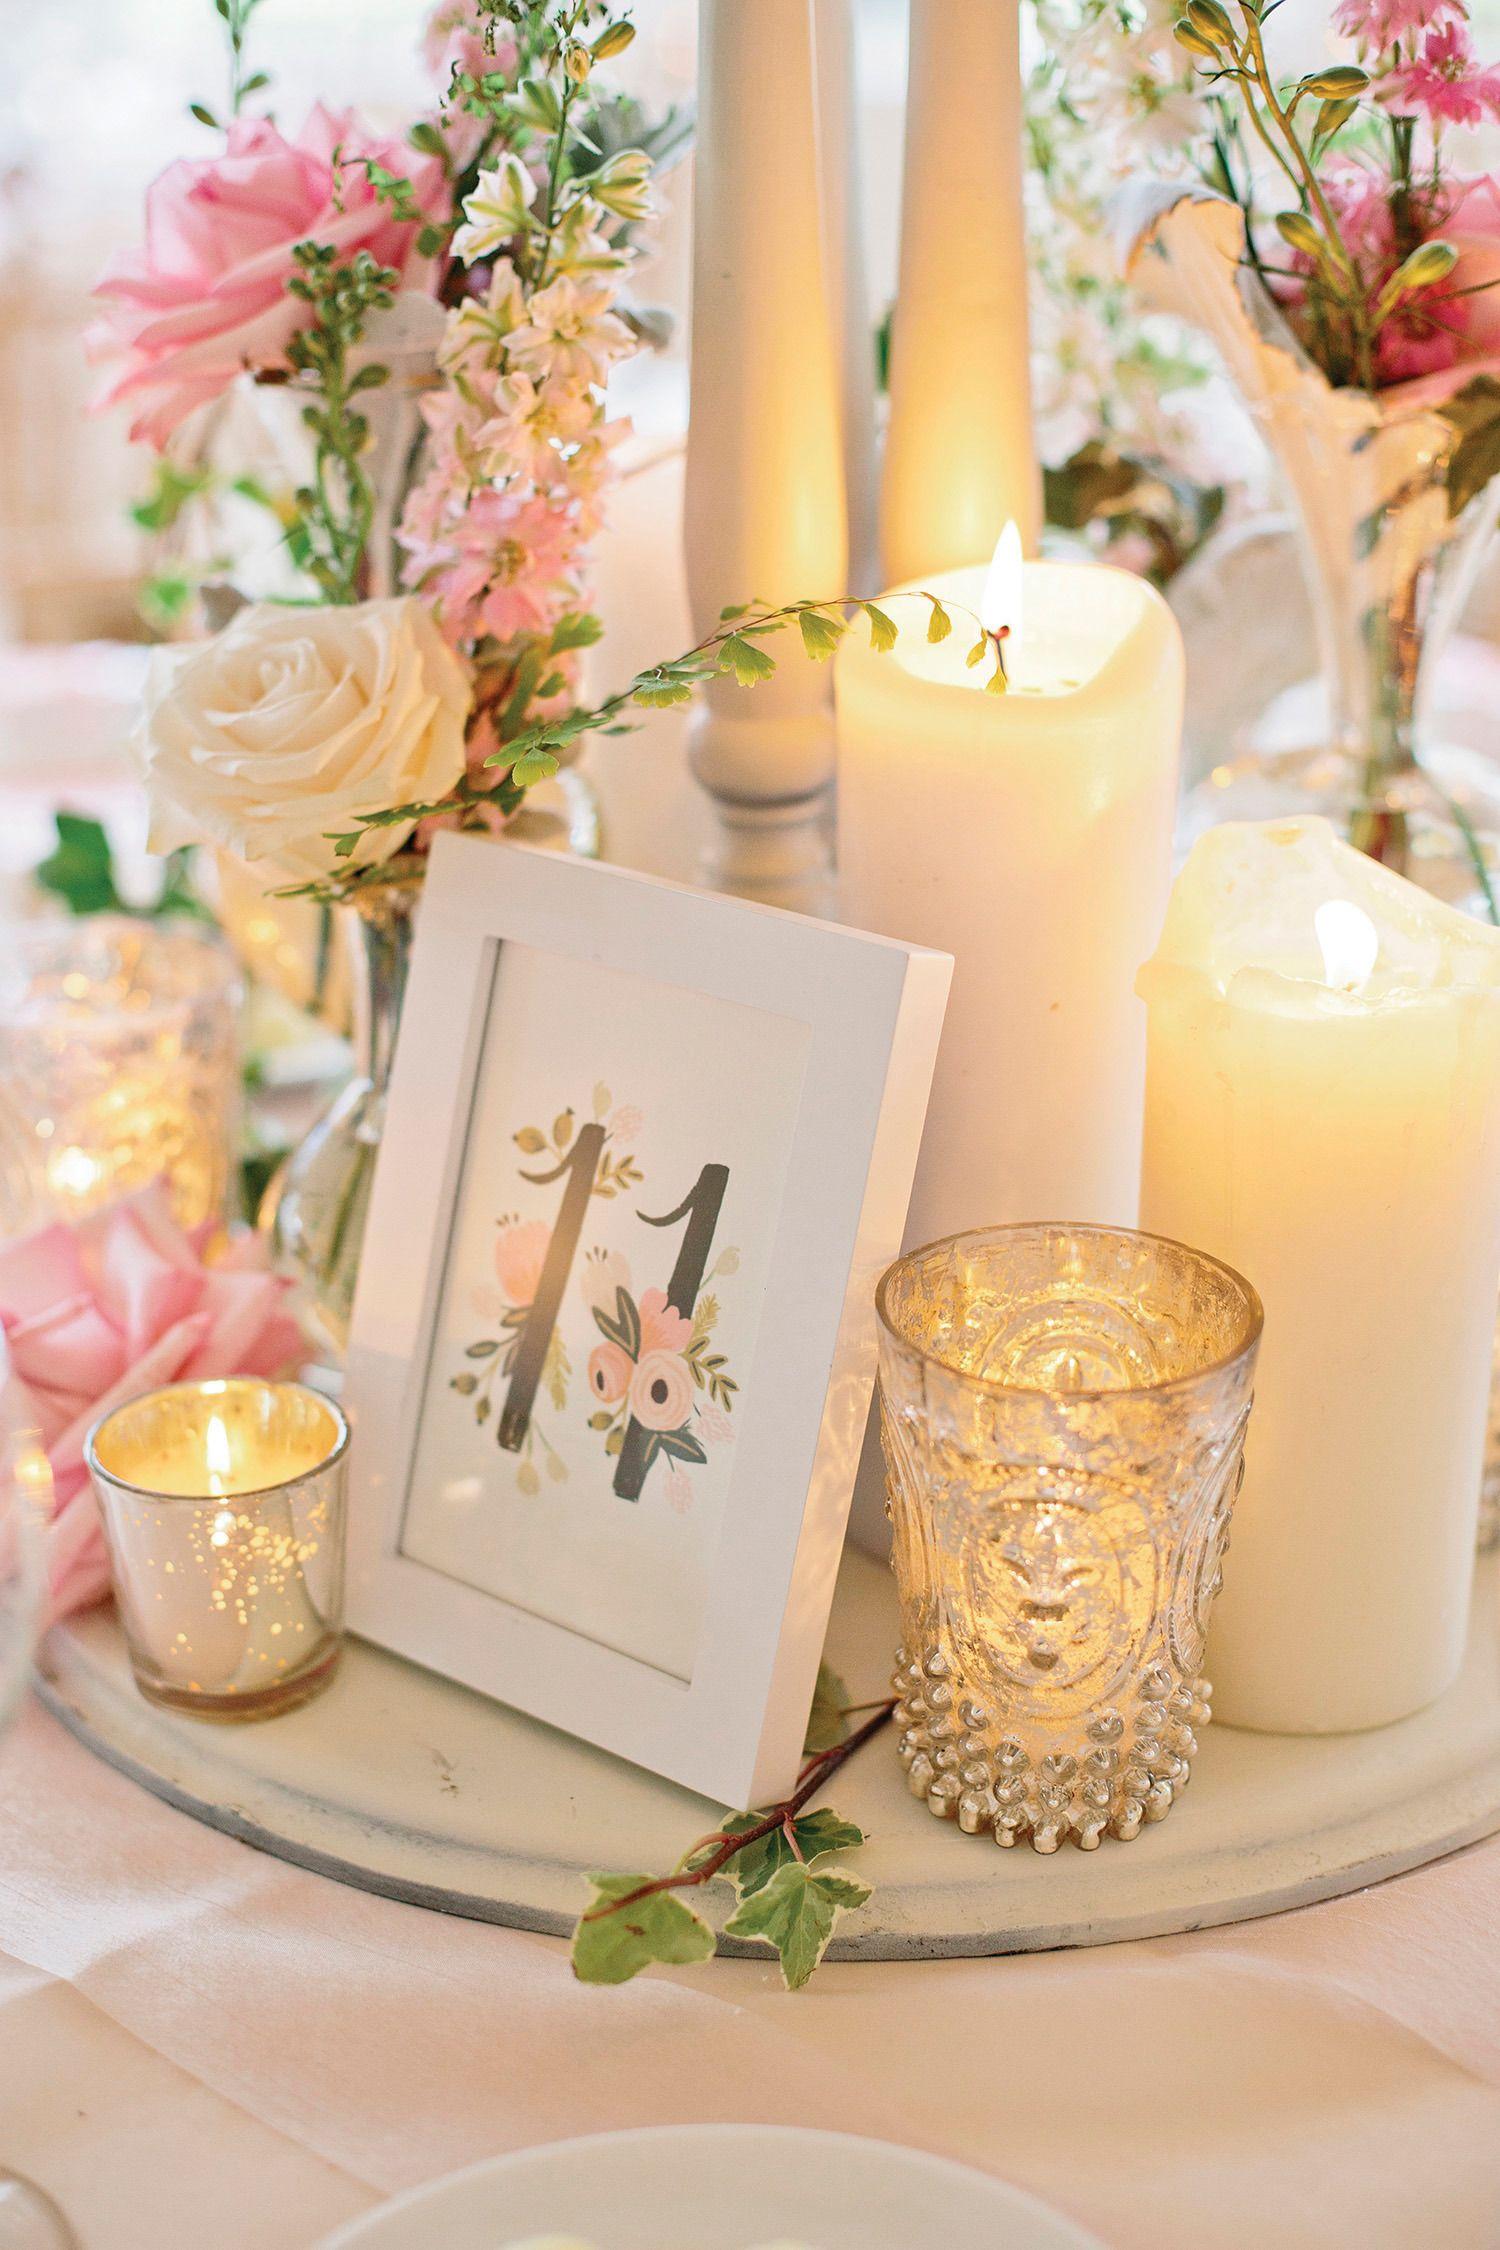 #centerpiece Photography: Hudson Nichols - hudsonnicholsphotography.com Floral Design: Petah Bashano - petahbashano.com Reception Venue: Philadelphia Cricket Club - www.philacricket.com Read More: http://www.stylemepretty.com/2015/02/25/philadelphia-blush-pink-ballroom-wedding/